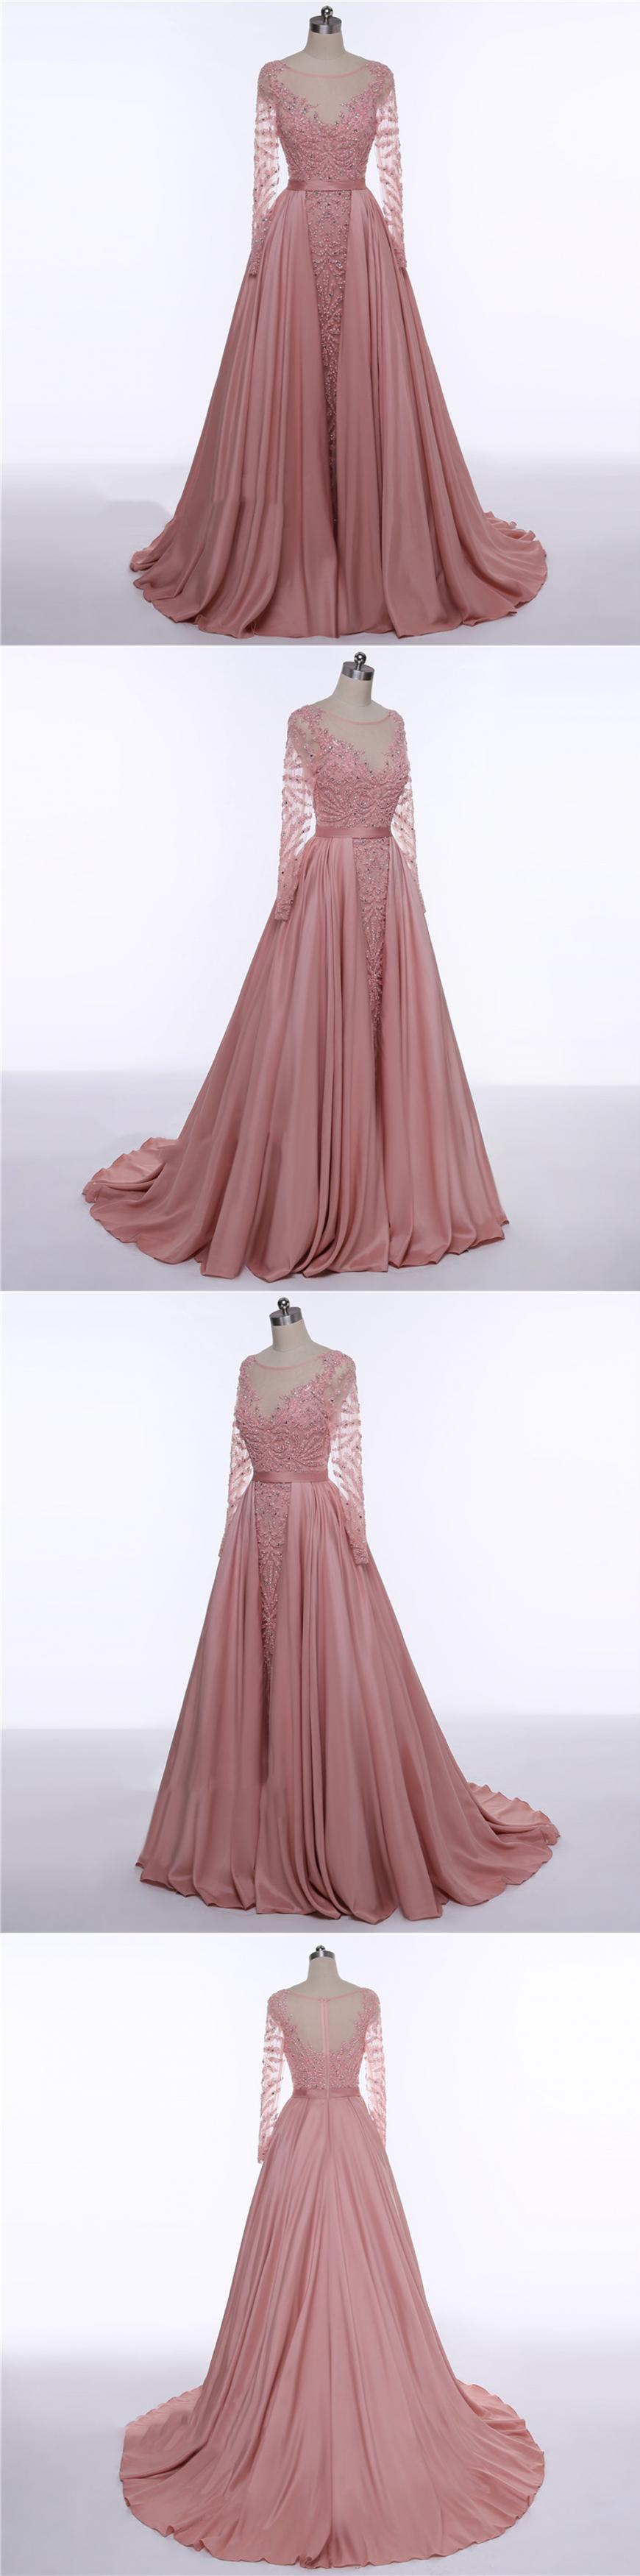 New Arrival Prom Dress,Dusty Pink Prom Dress,Detachable Prom Dress ...